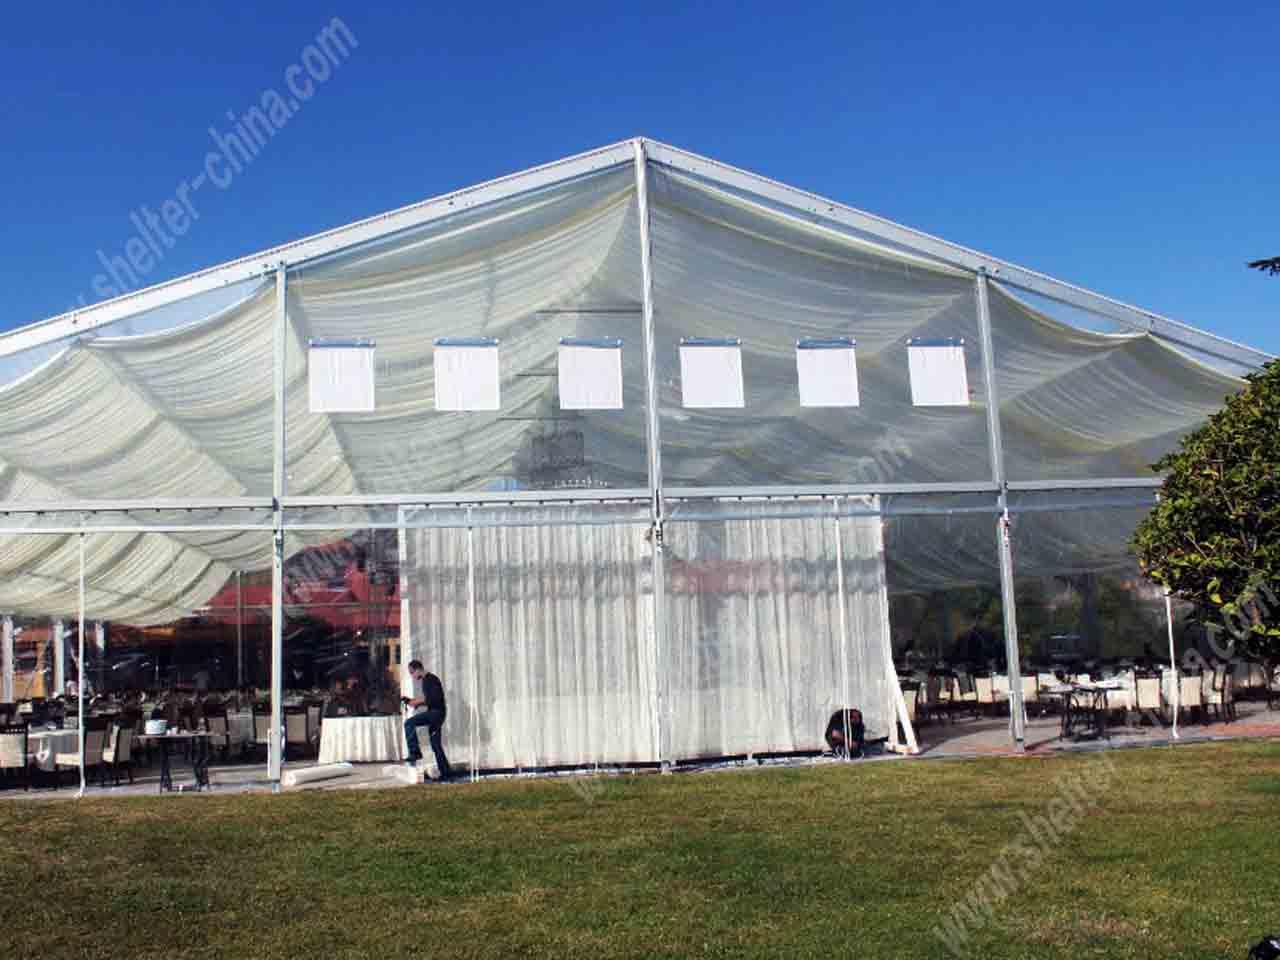 Outdoor Clear Top Party Wedding Tents Rentals